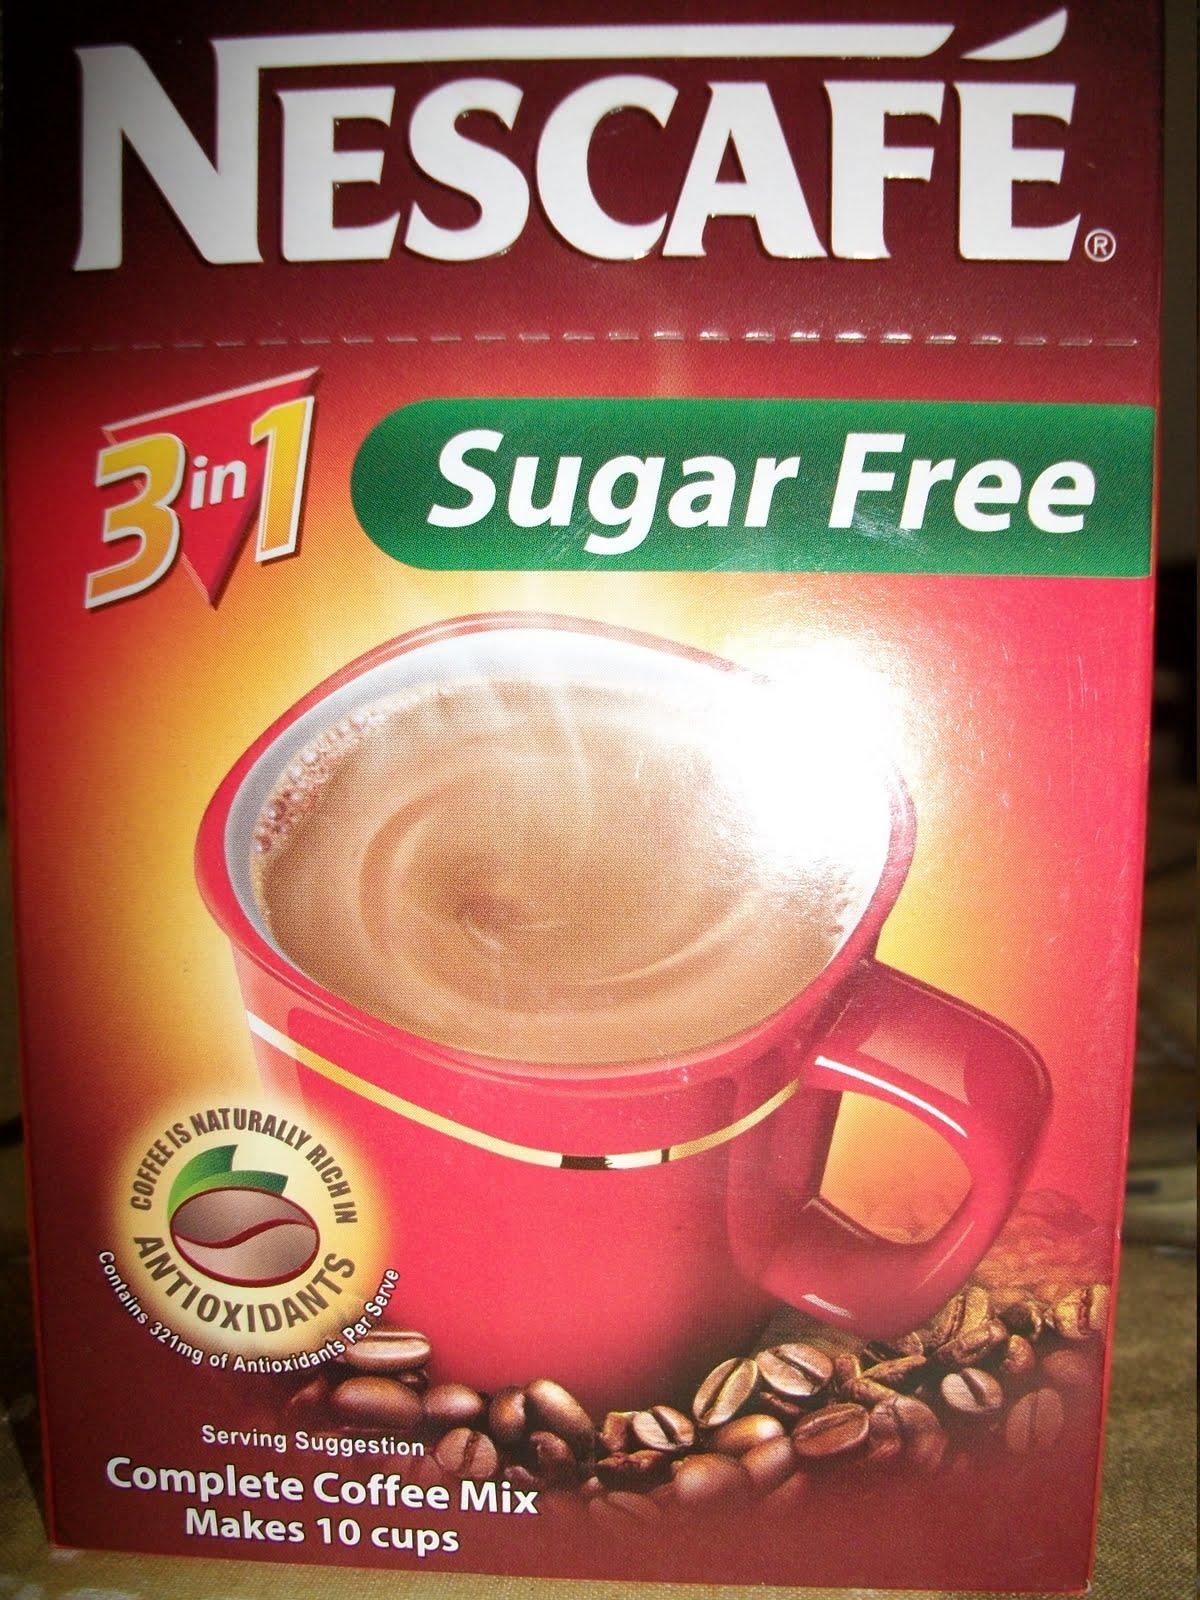 Sugar Free Dress: Low Carb Pinay: Sugar Free 3-in-1 Coffee Review